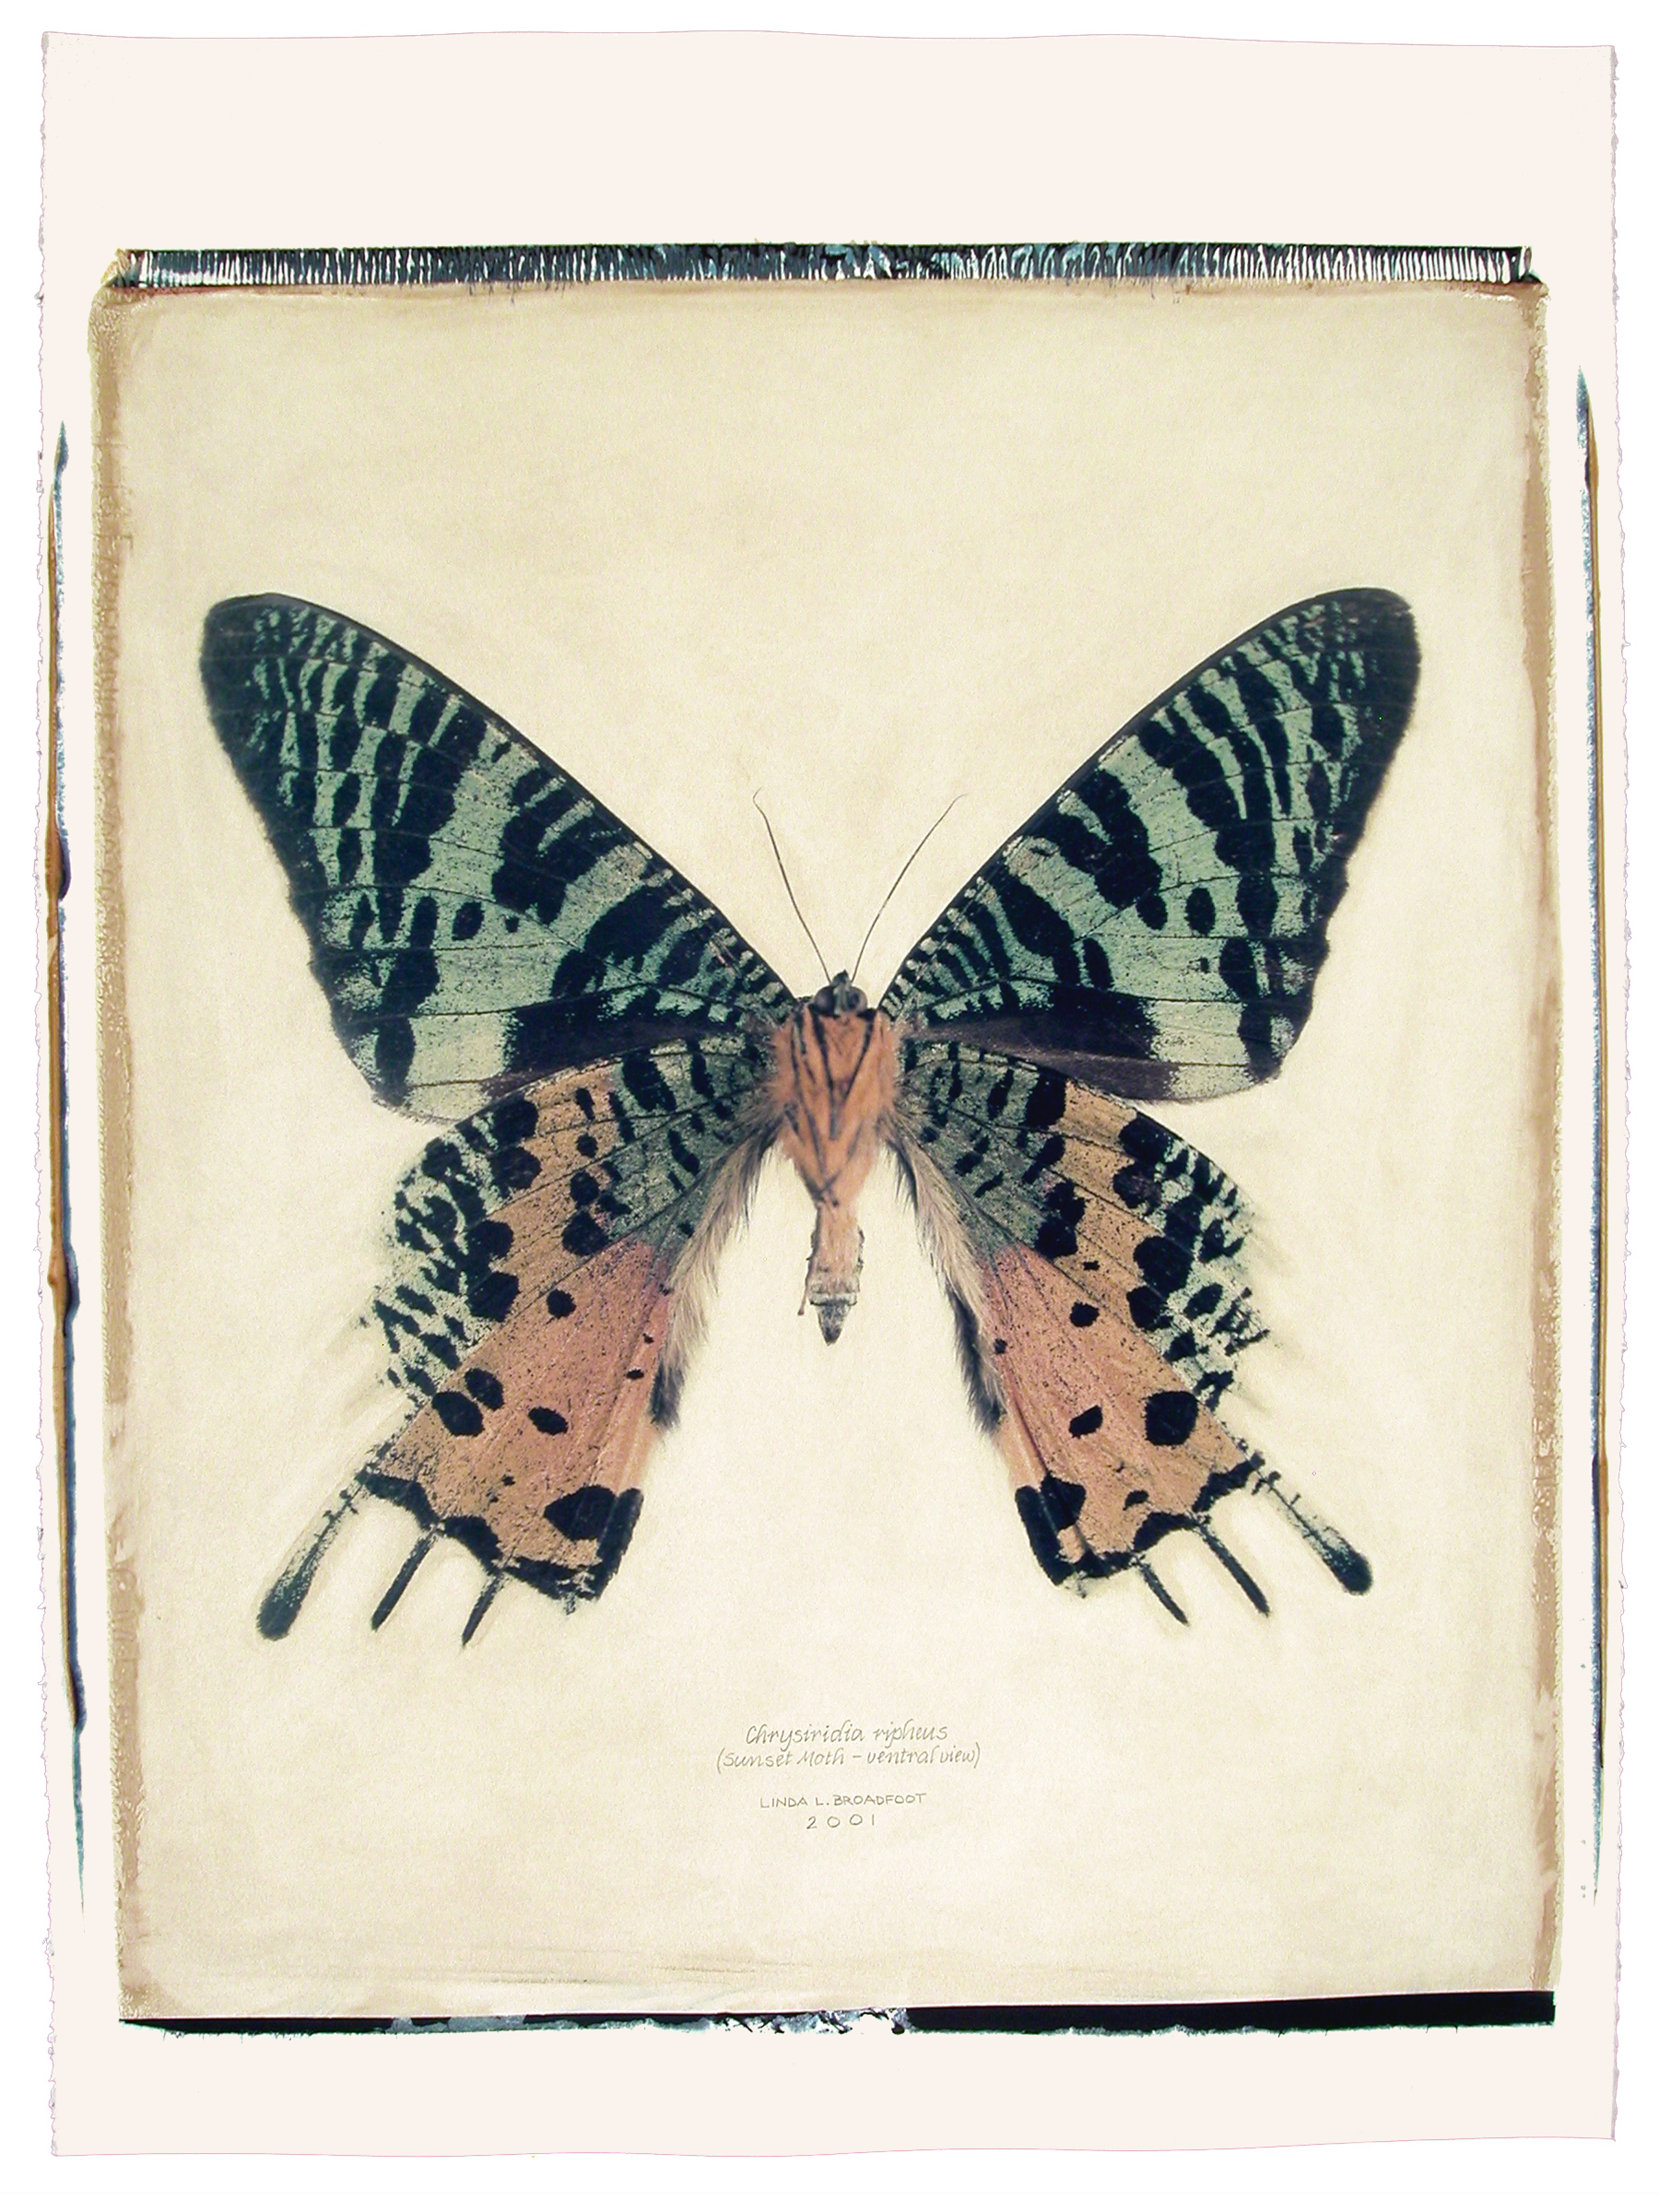 Chrysiridia ripheus  (Sunset Moth), ventral view, 2001